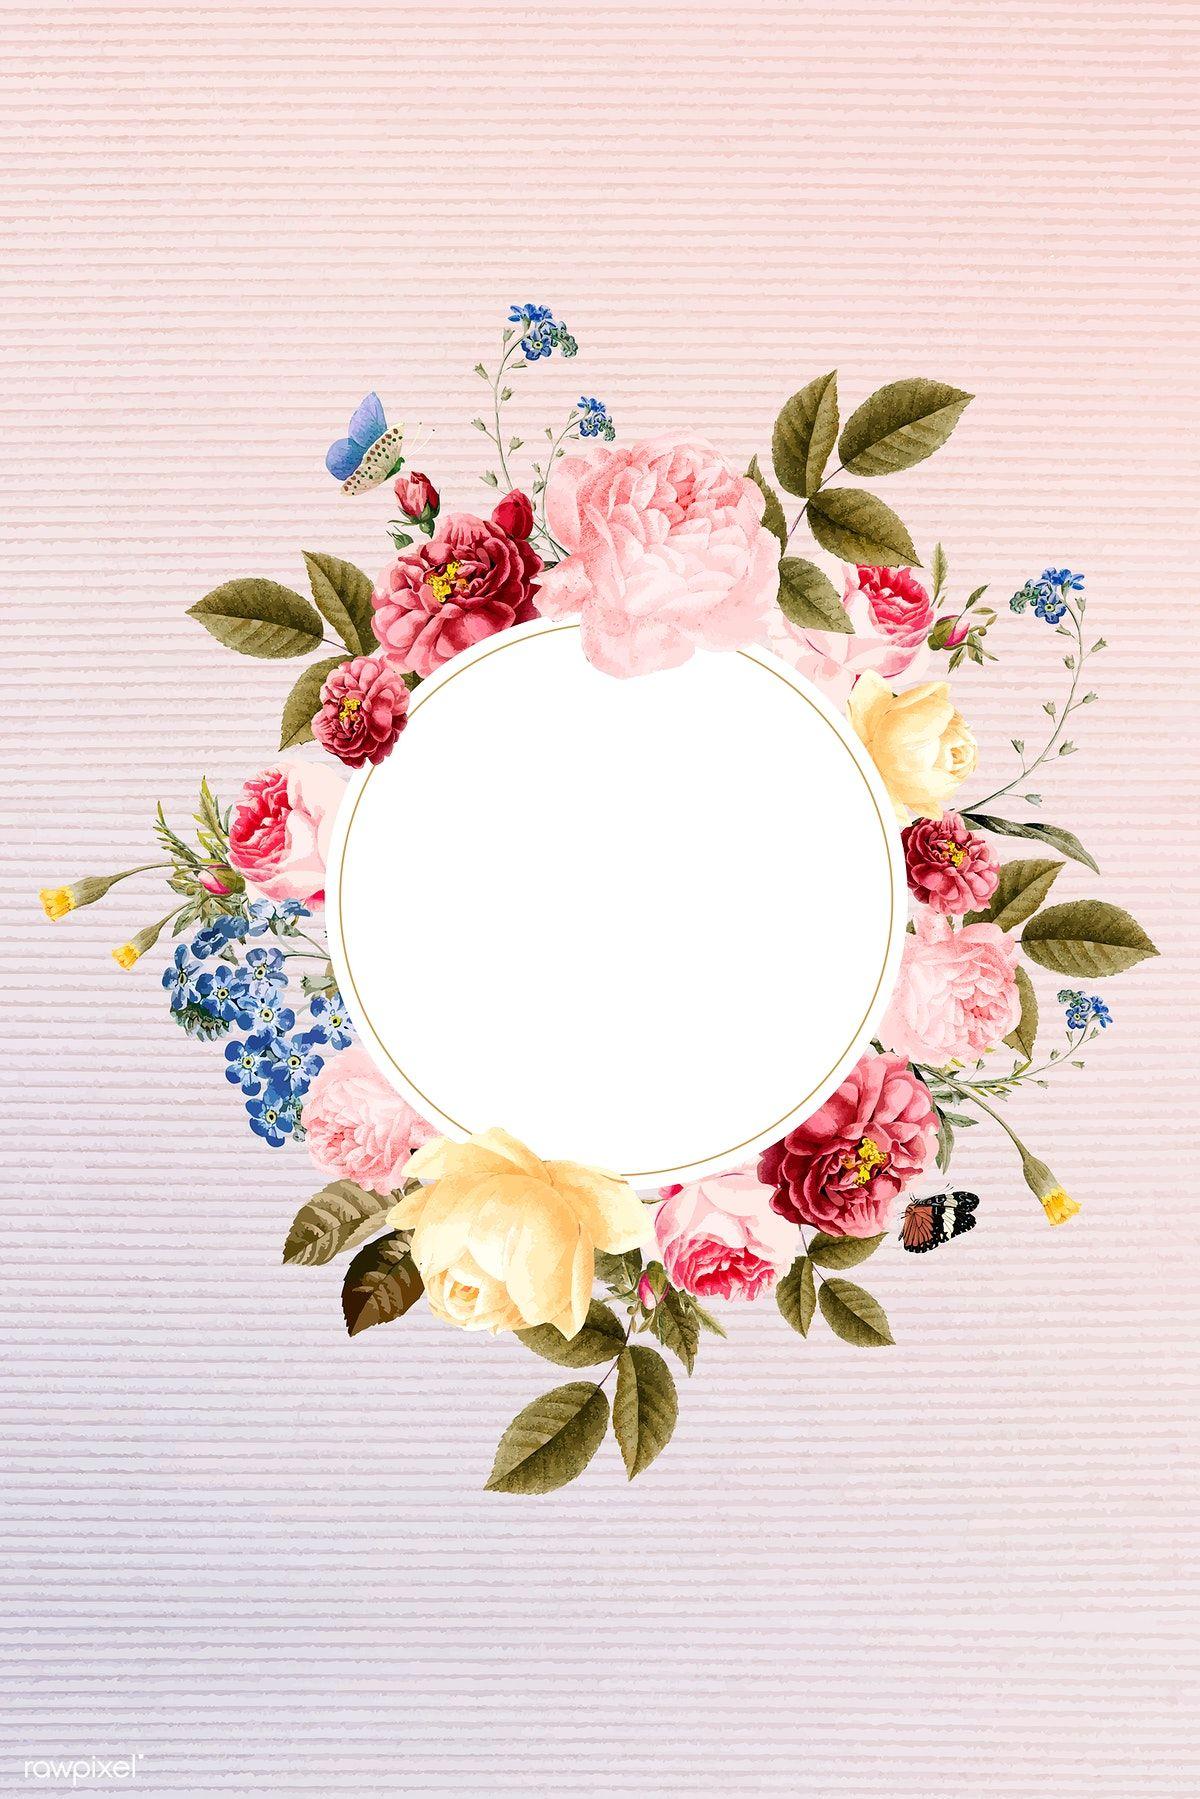 Download Premium Vector Of Floral Round Frame On A Fabric Background Round Frame Flower Doodles Floral Illustrations